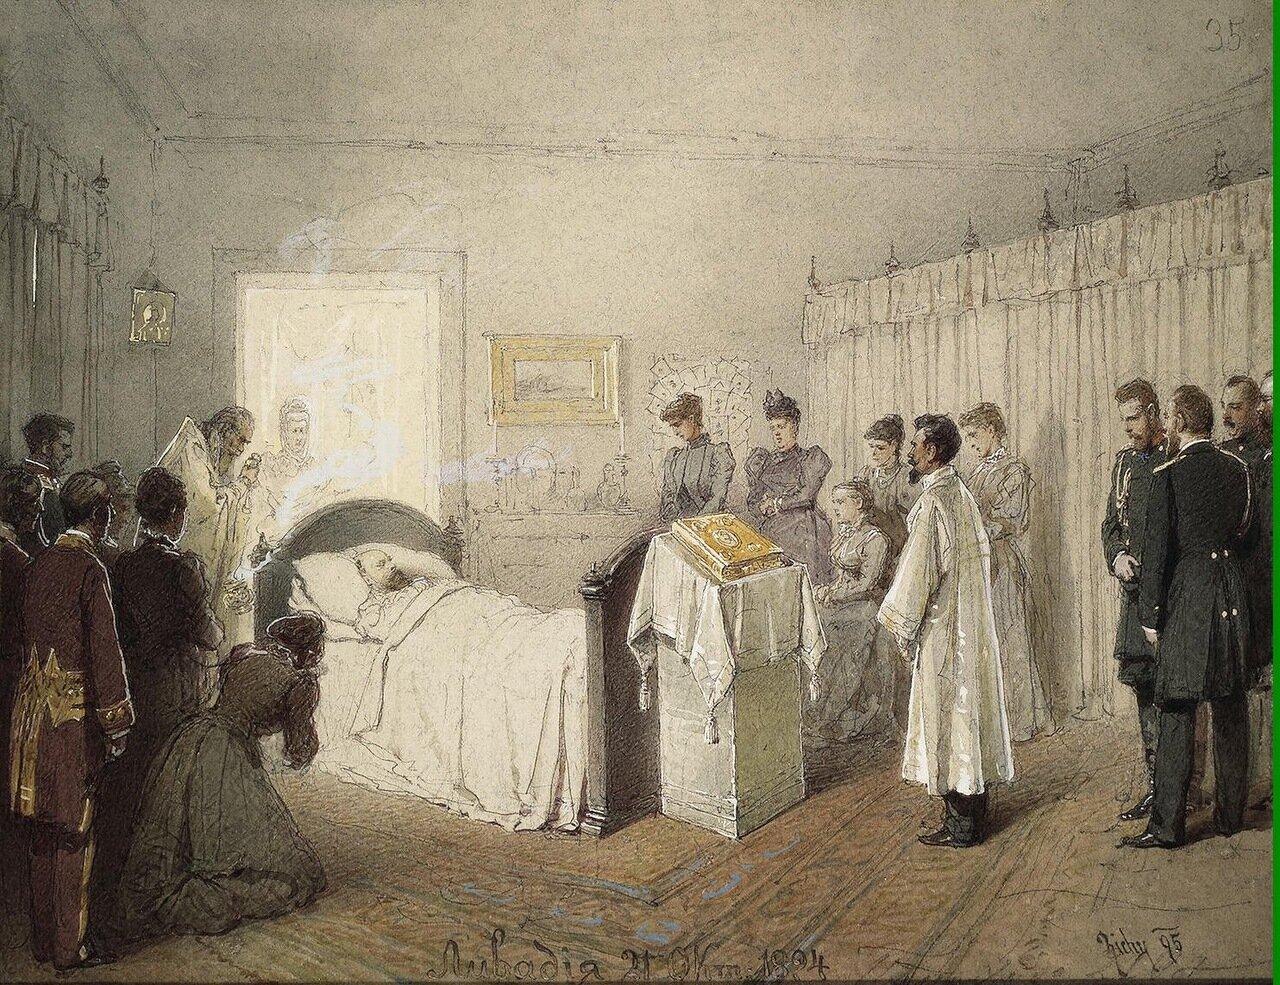 Заупокойная служба по умершему Александру III в комнате Ливадийского дворца 21 октября 1894 года.